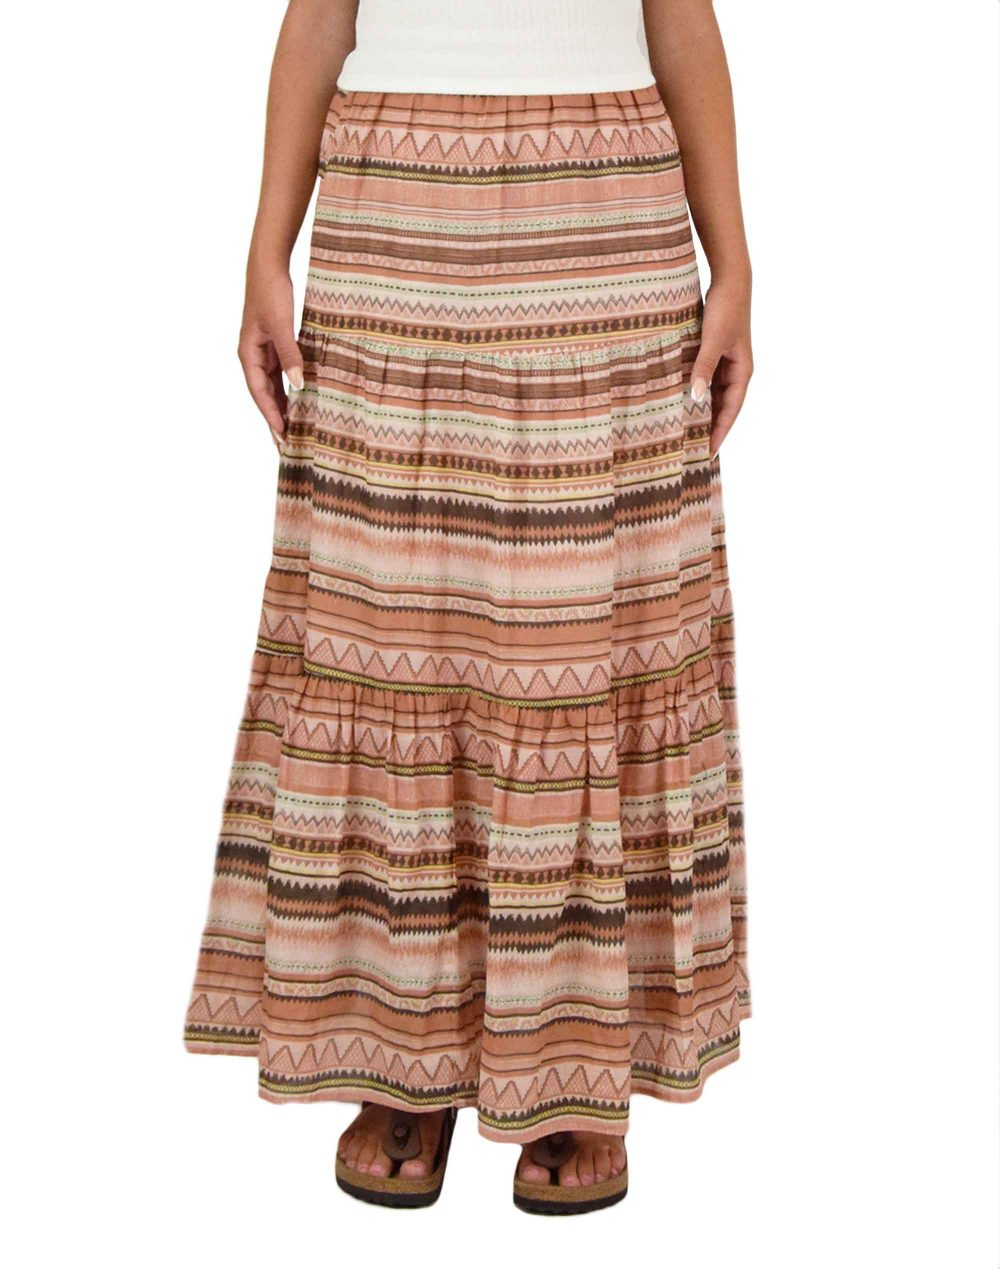 Only Asia Life Maxi Skirt (15230013) Burnt Coral/Desert